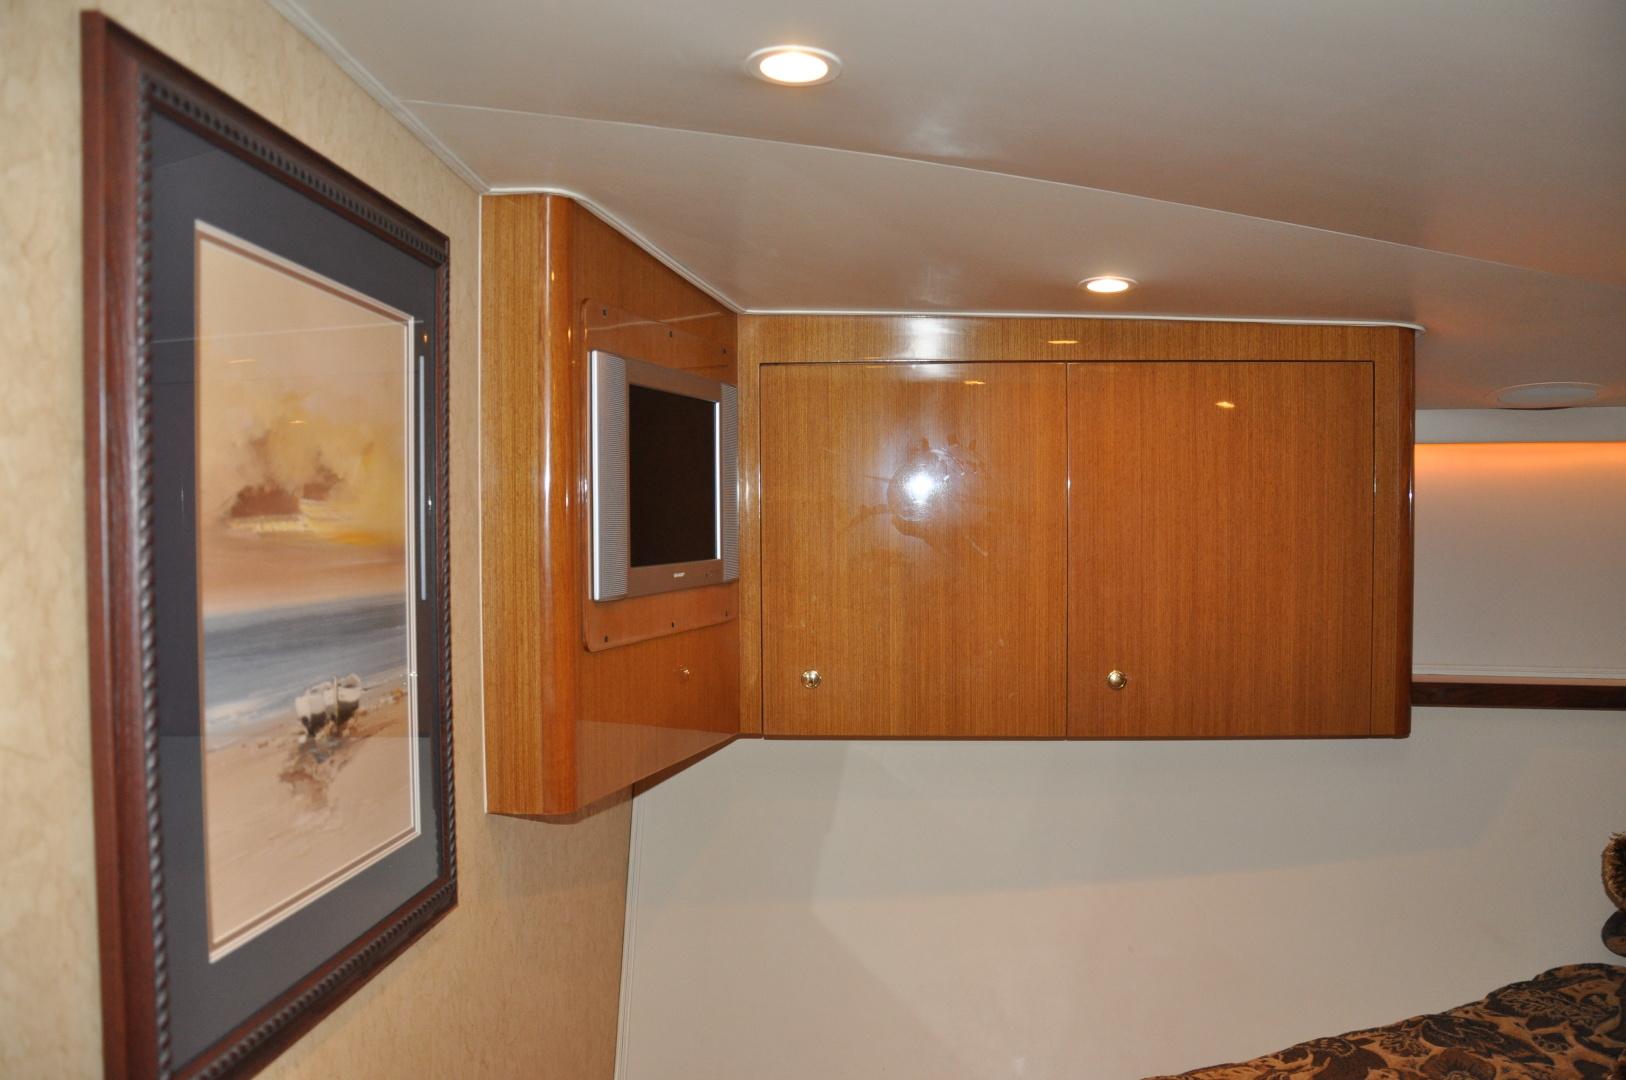 Viking-Convertible 2003-Reel Cowboy Deerfield Beach-Florida-United States-Master Stateroom-1546874 | Thumbnail